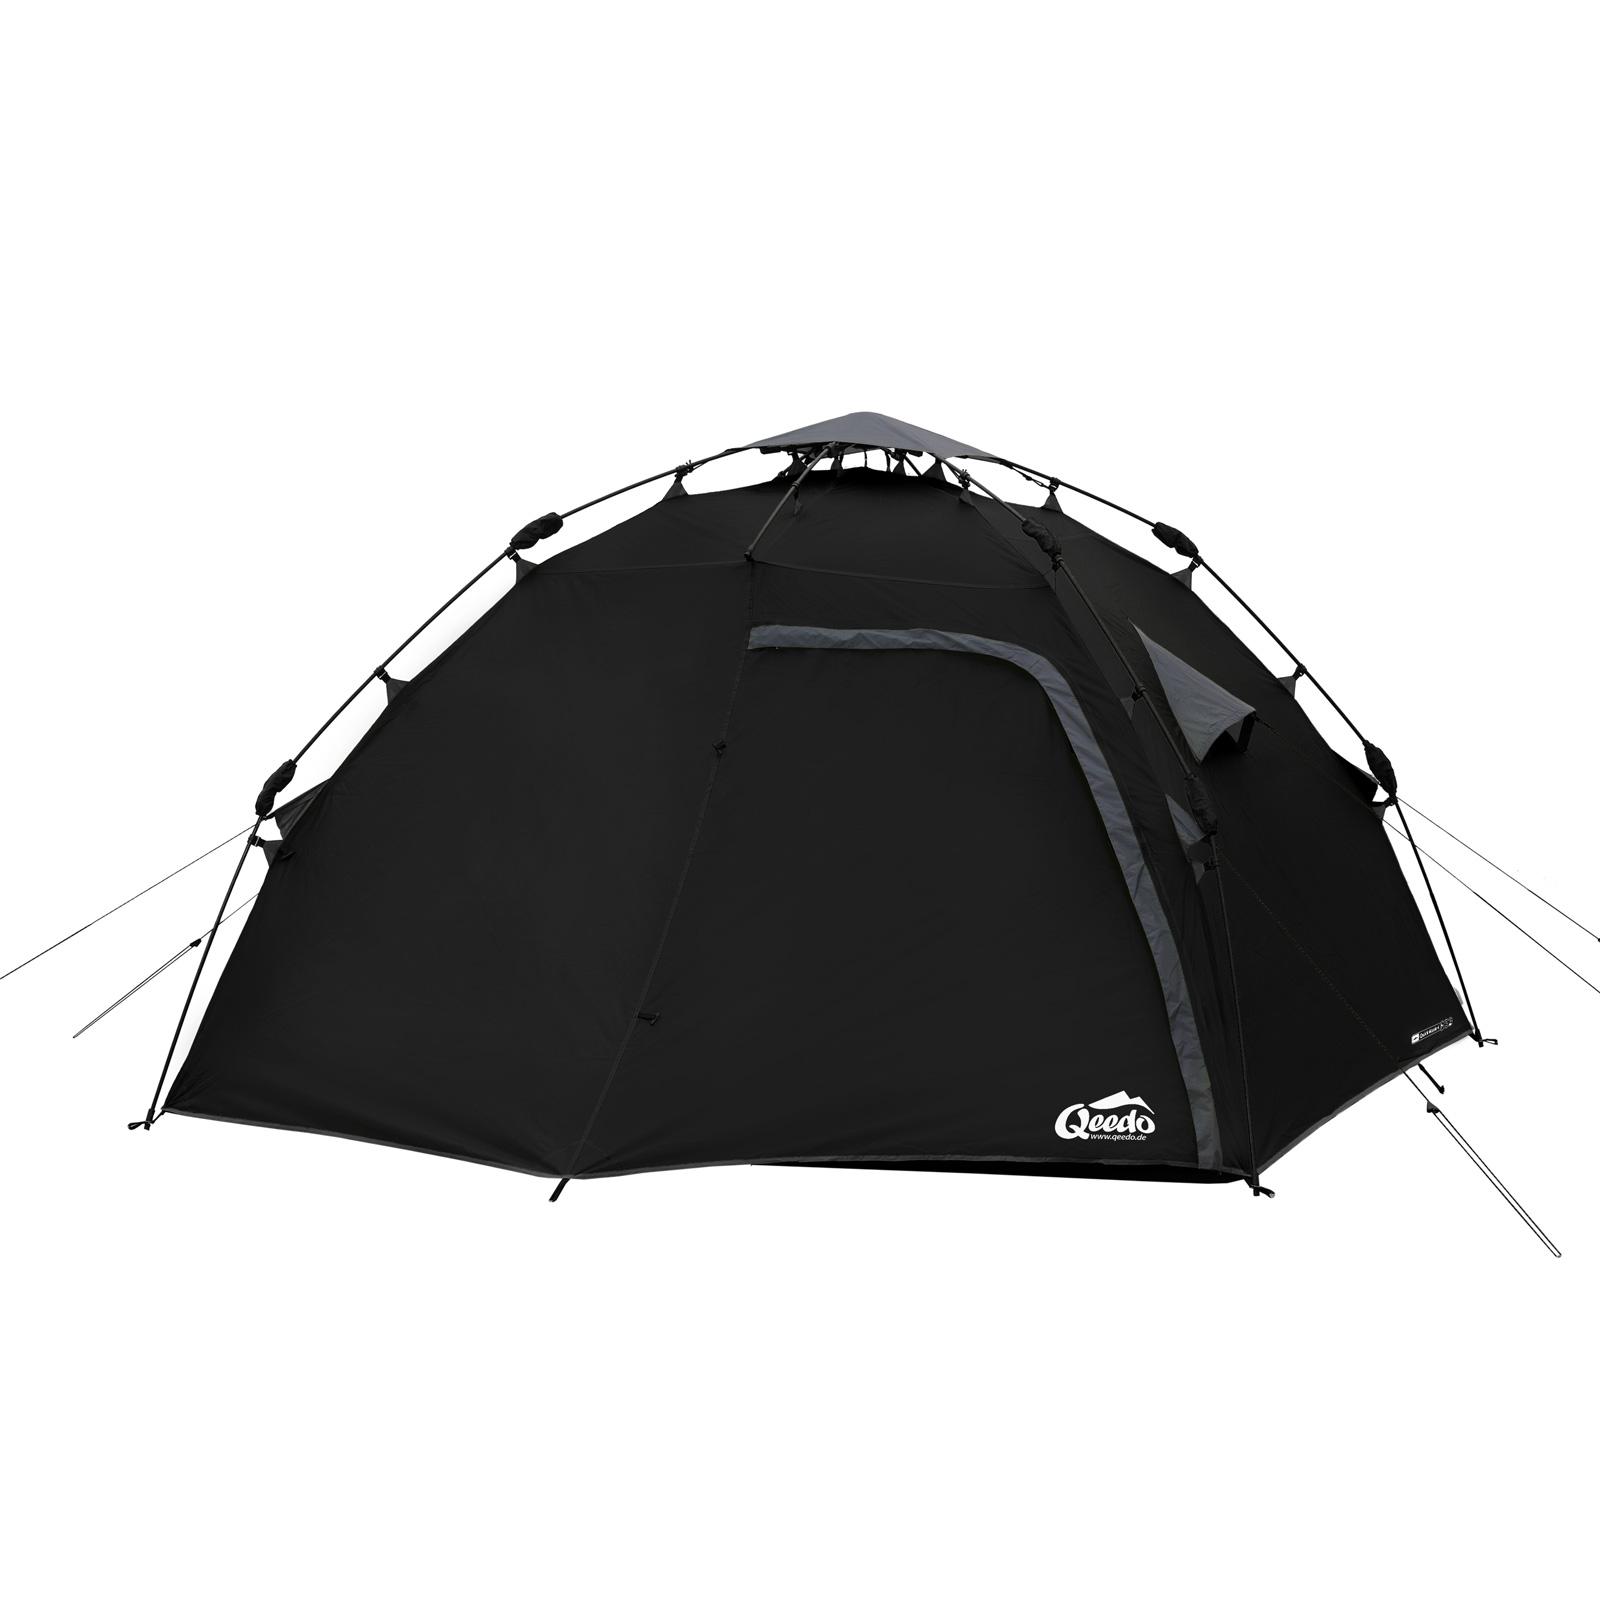 4 mann zelt qeedo quick maple 4 sekundenzelt campingzelt wurfzelt pop up zelt ebay. Black Bedroom Furniture Sets. Home Design Ideas